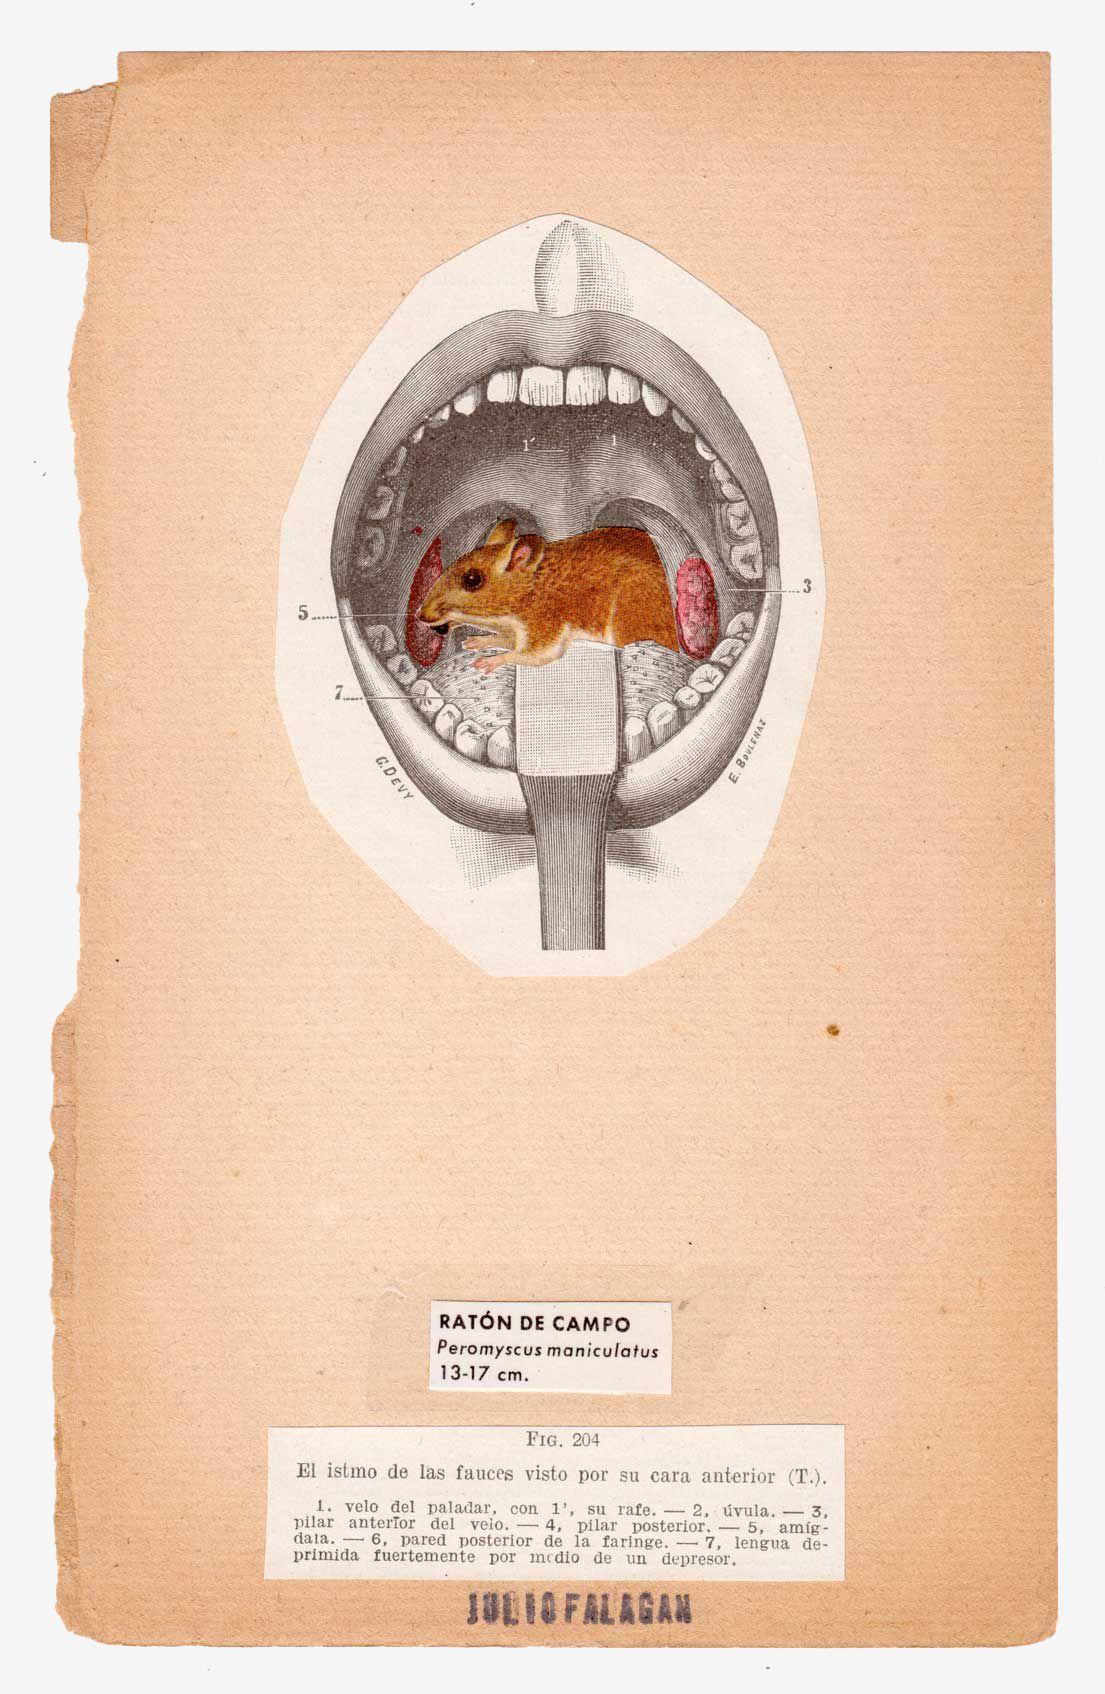 Moderno Anatomía De Ratón Friso - Imágenes de Anatomía Humana ...